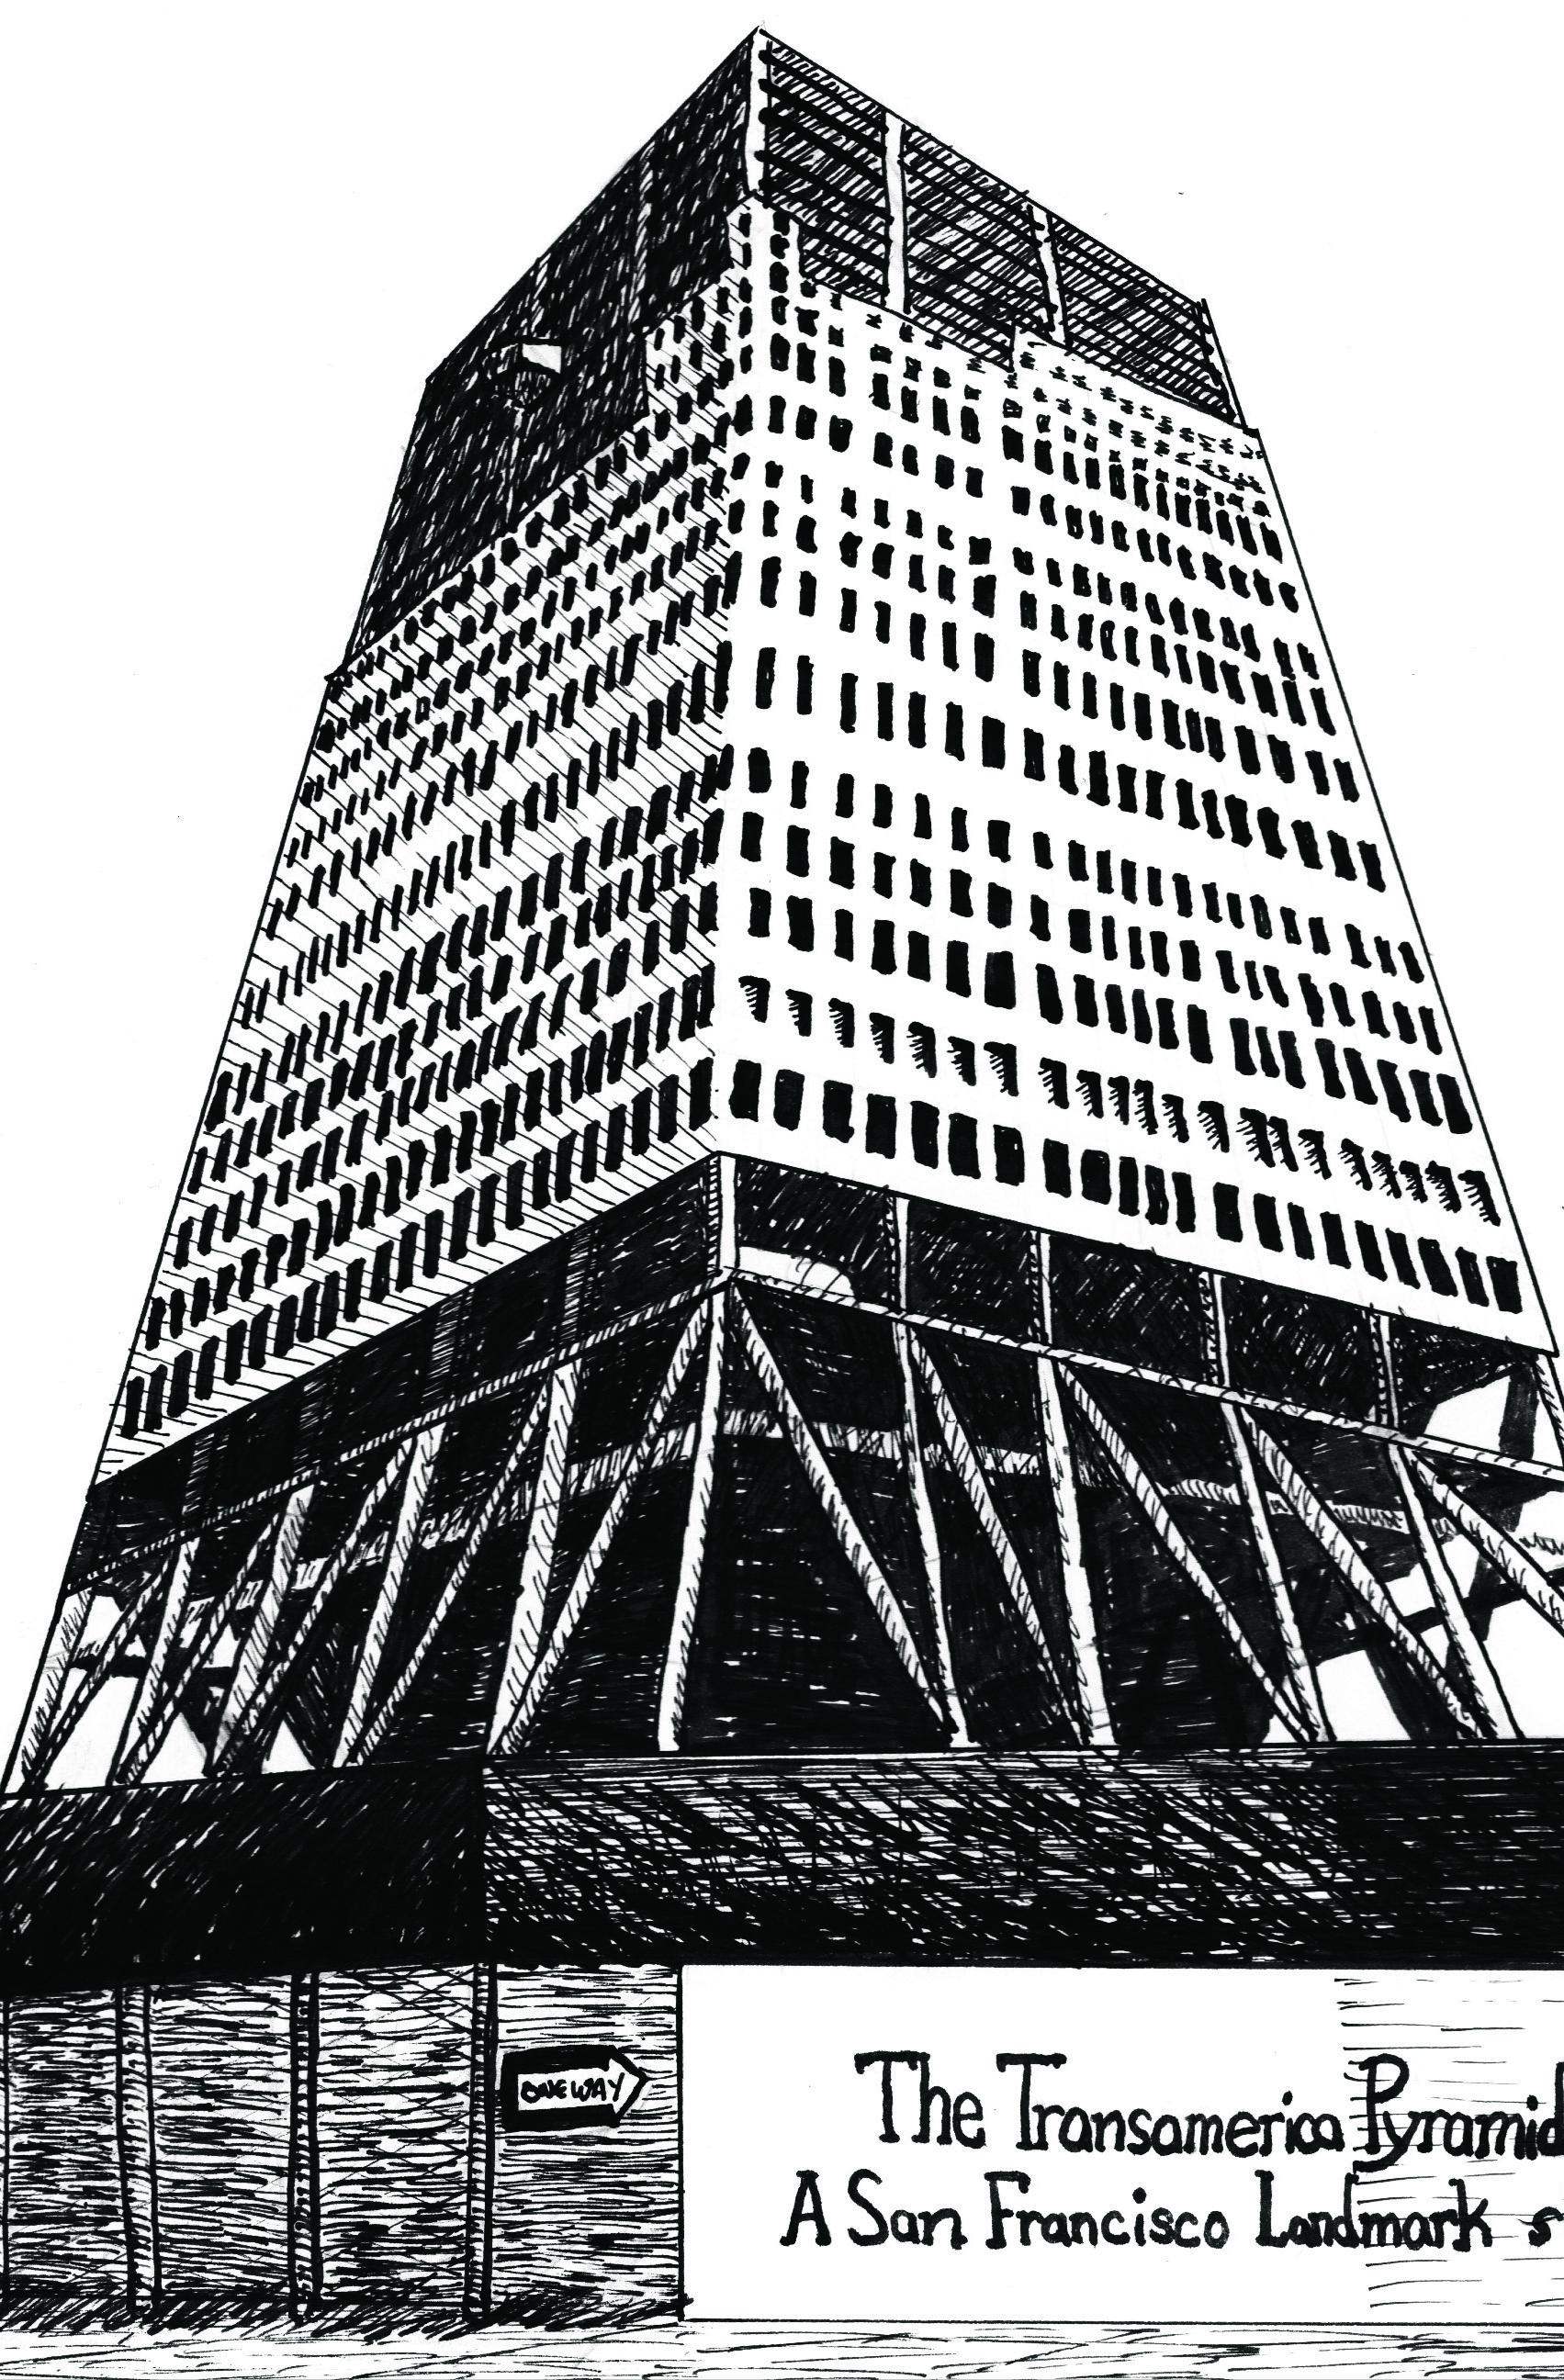 Transamercia Pyramid, 1971